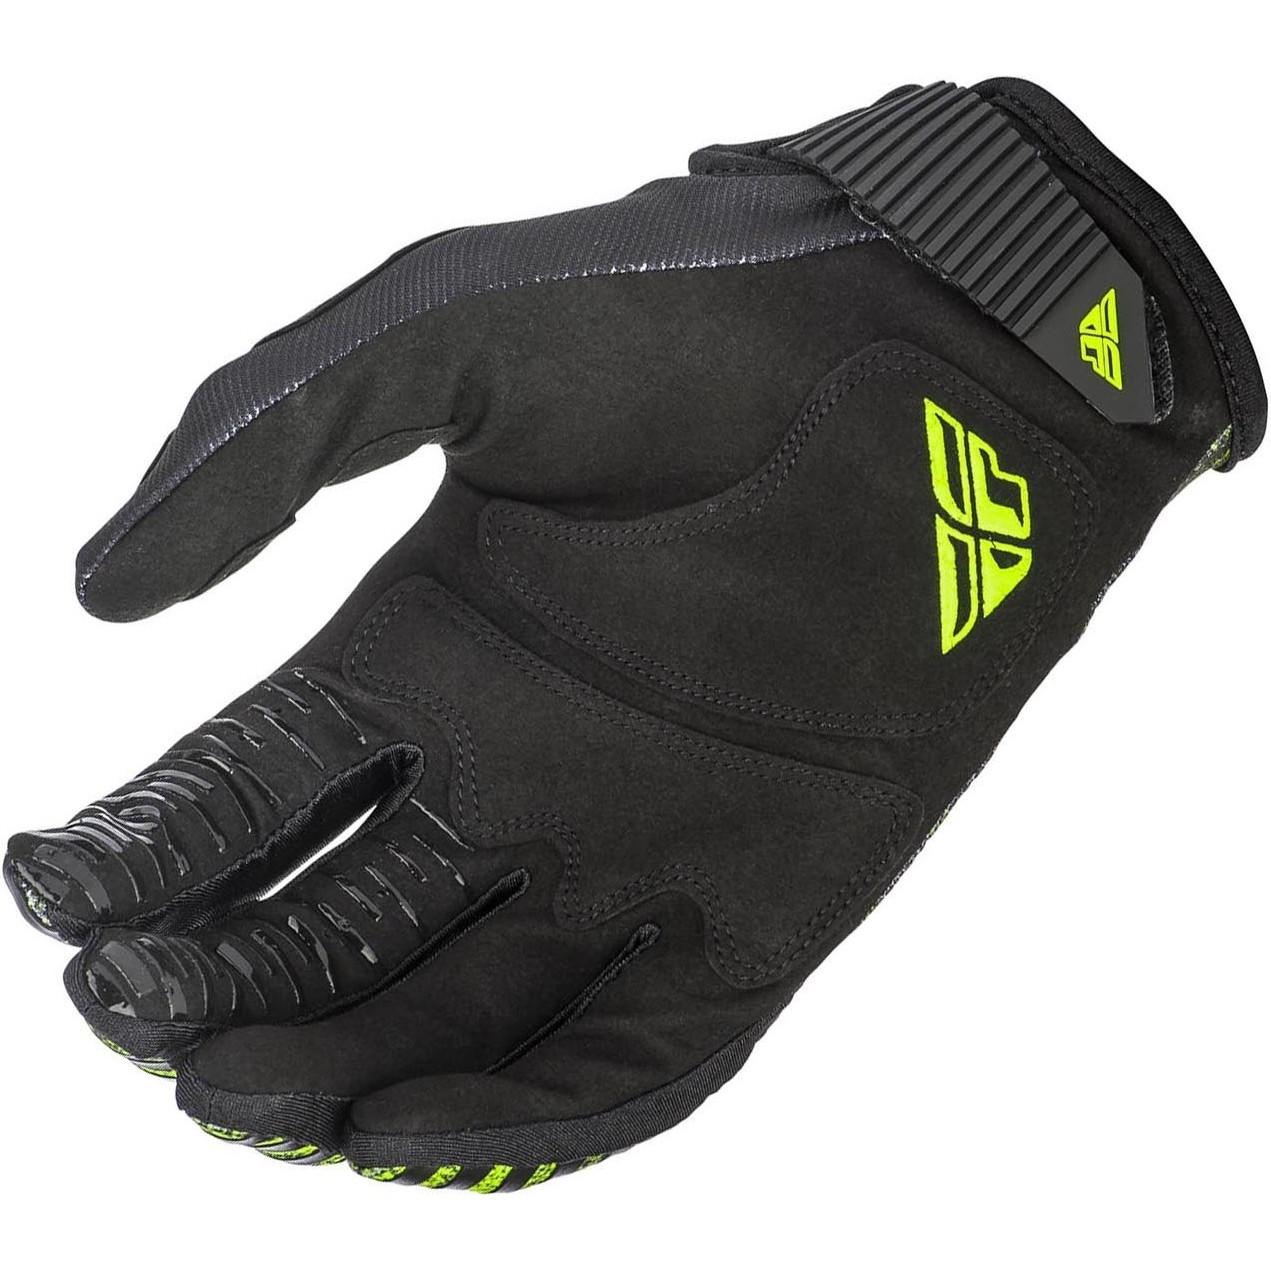 Fly-Racing-2019-Kinetic-Noiz-Youth-Motocross-Gloves-Junior-Off-Road-MX-ATV-Dirt thumbnail 12